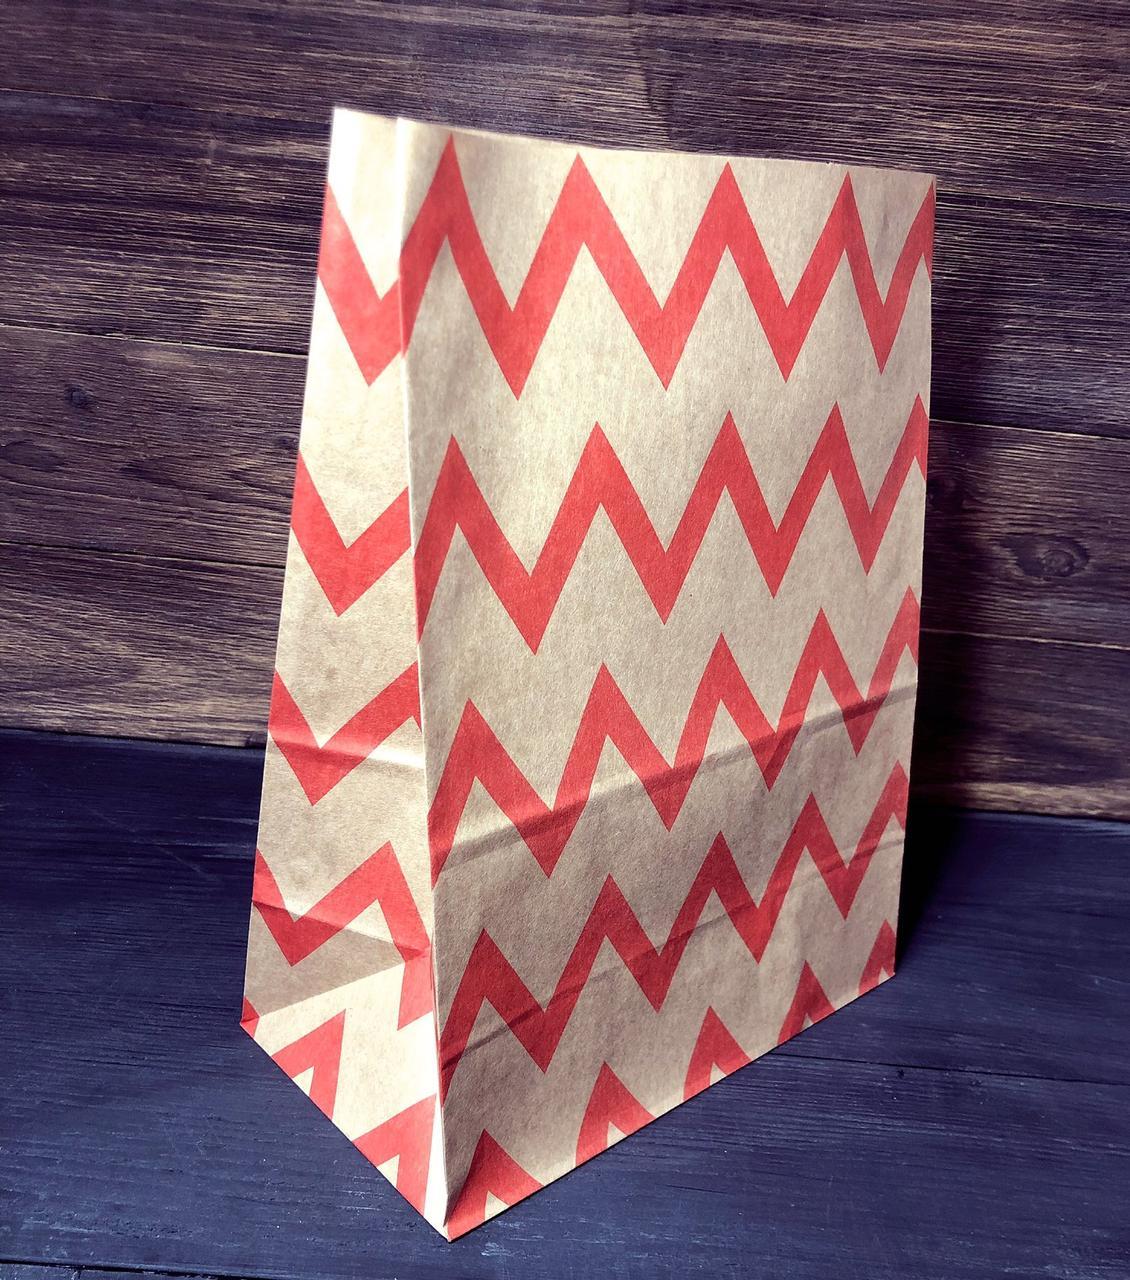 Подарочный пакет бумажный с рисунком орнамент 210х120х290 мм